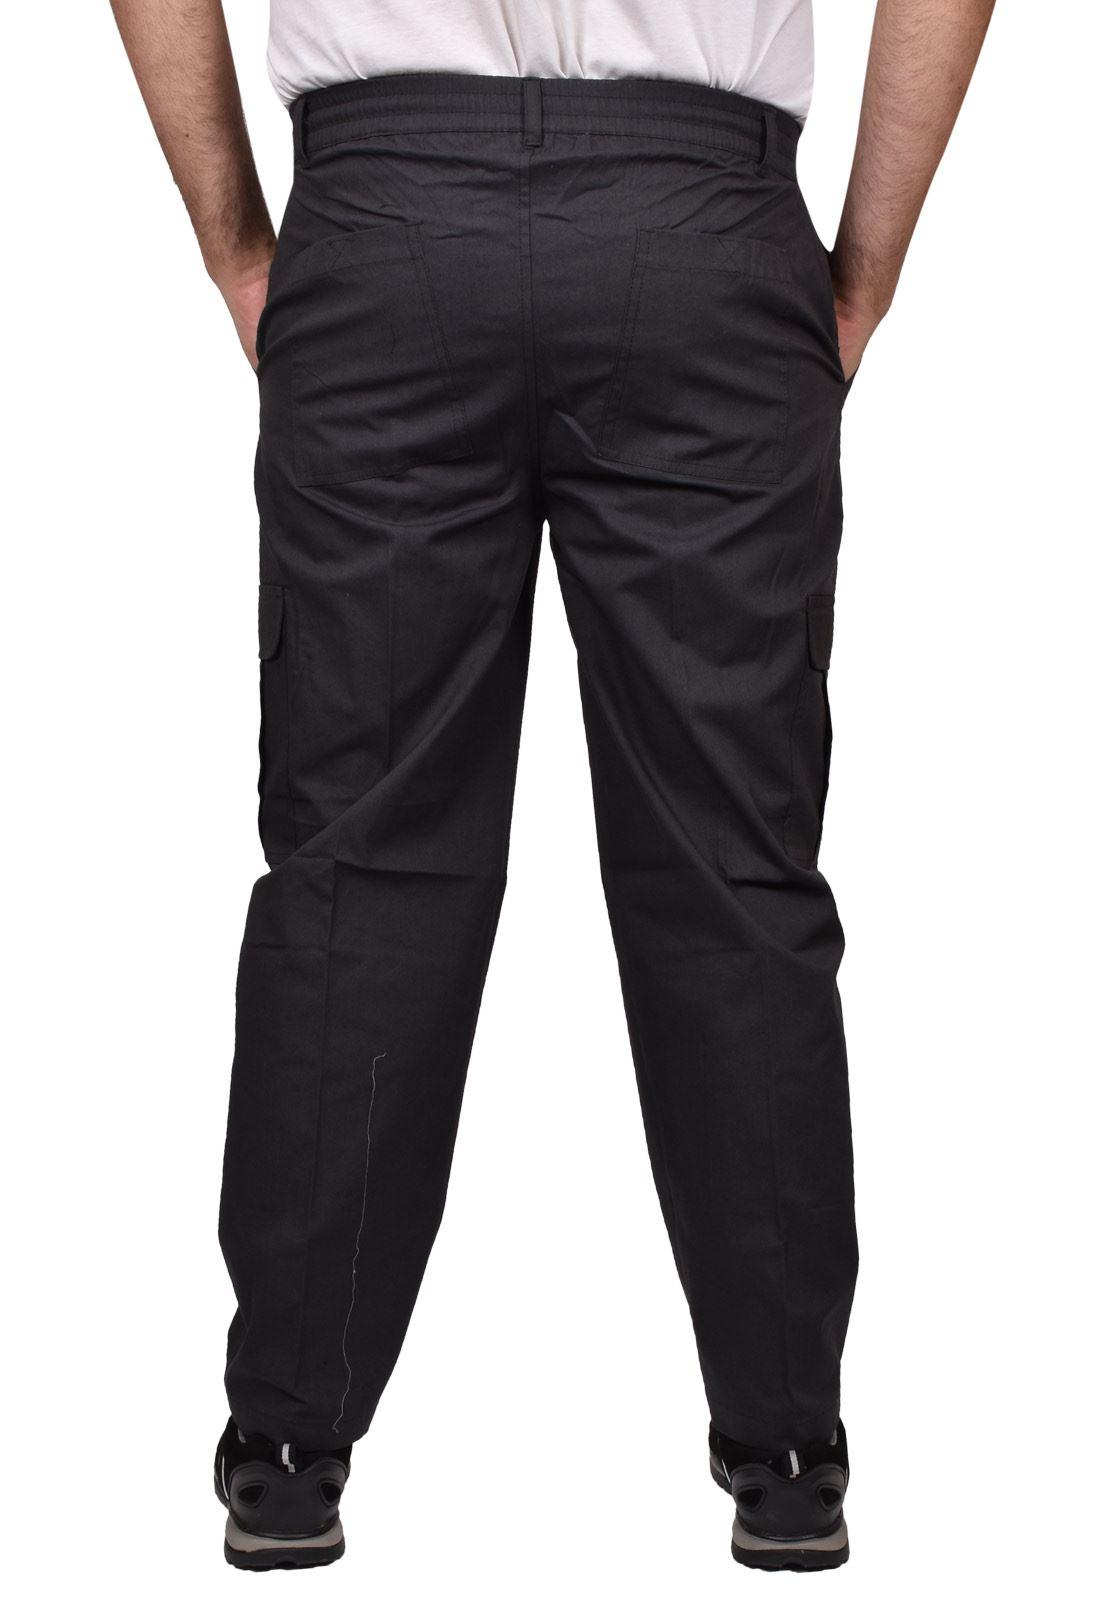 Para-Hombre-De-Carga-Combate-Pantalones-De-Trabajo-Bolsillos-Patrulla-Tactico-Pro-Algodon-Pantalones miniatura 8